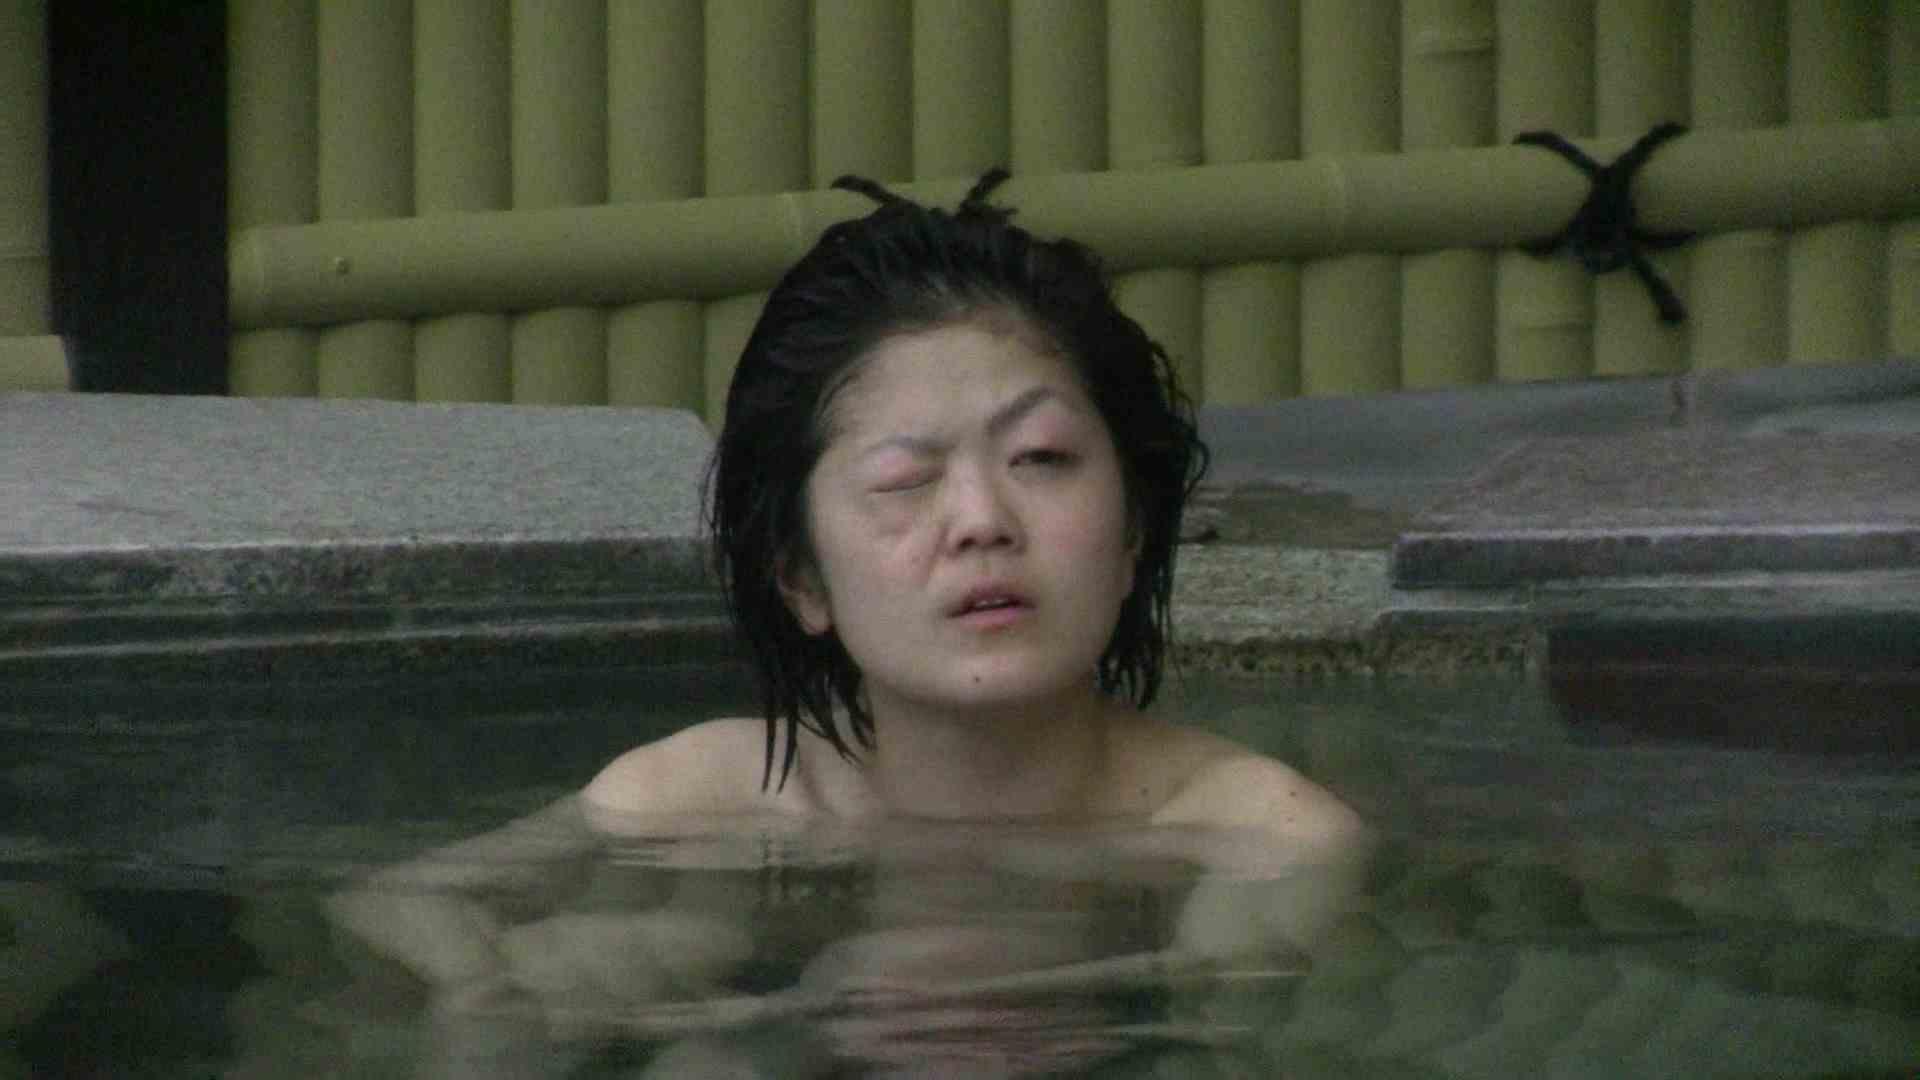 Aquaな露天風呂Vol.538 露天風呂突入   美しいOLの裸体  82pic 43